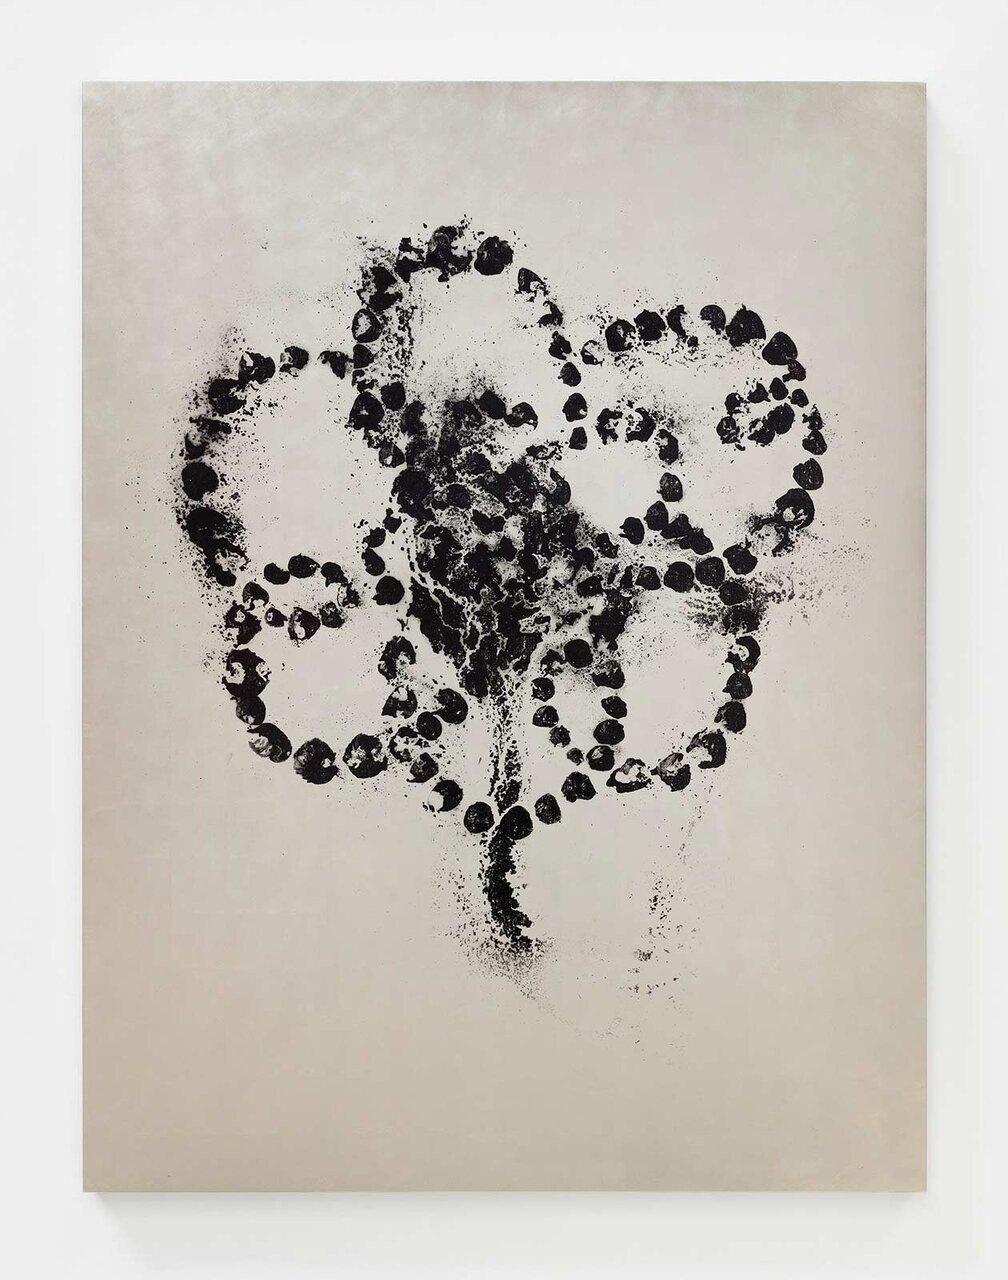 Jean-Michel OTHONIEL Kiku - Kokushokuiro (black), black ink on white gold leaf, 164 x 124 x 5 cm © Jean-Michel Othoniel / JASPAR, Tokyo 2020 Photo: Claire Dorn / Courtesy of the artist and Perrotin